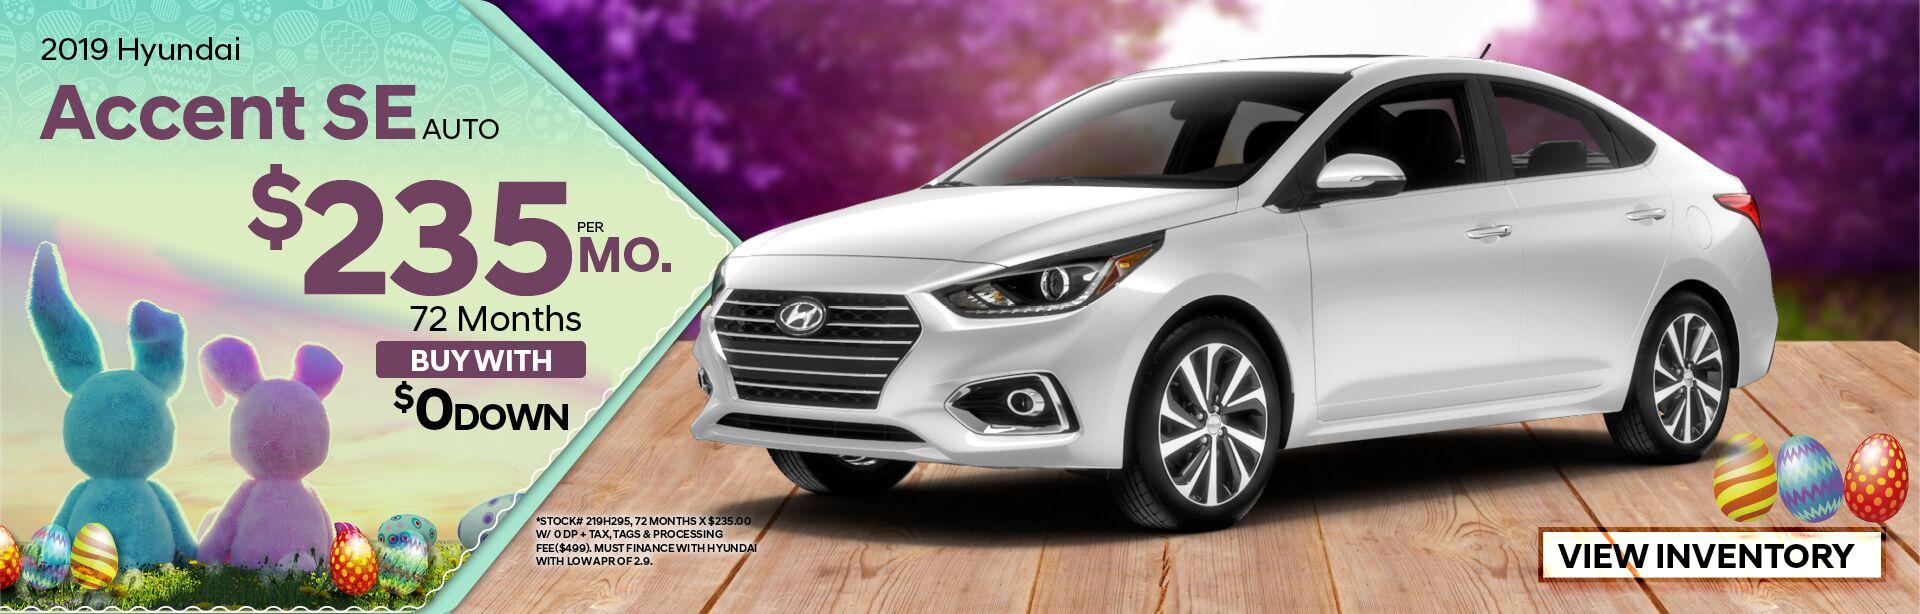 2019 Hyundai Accent Se Special